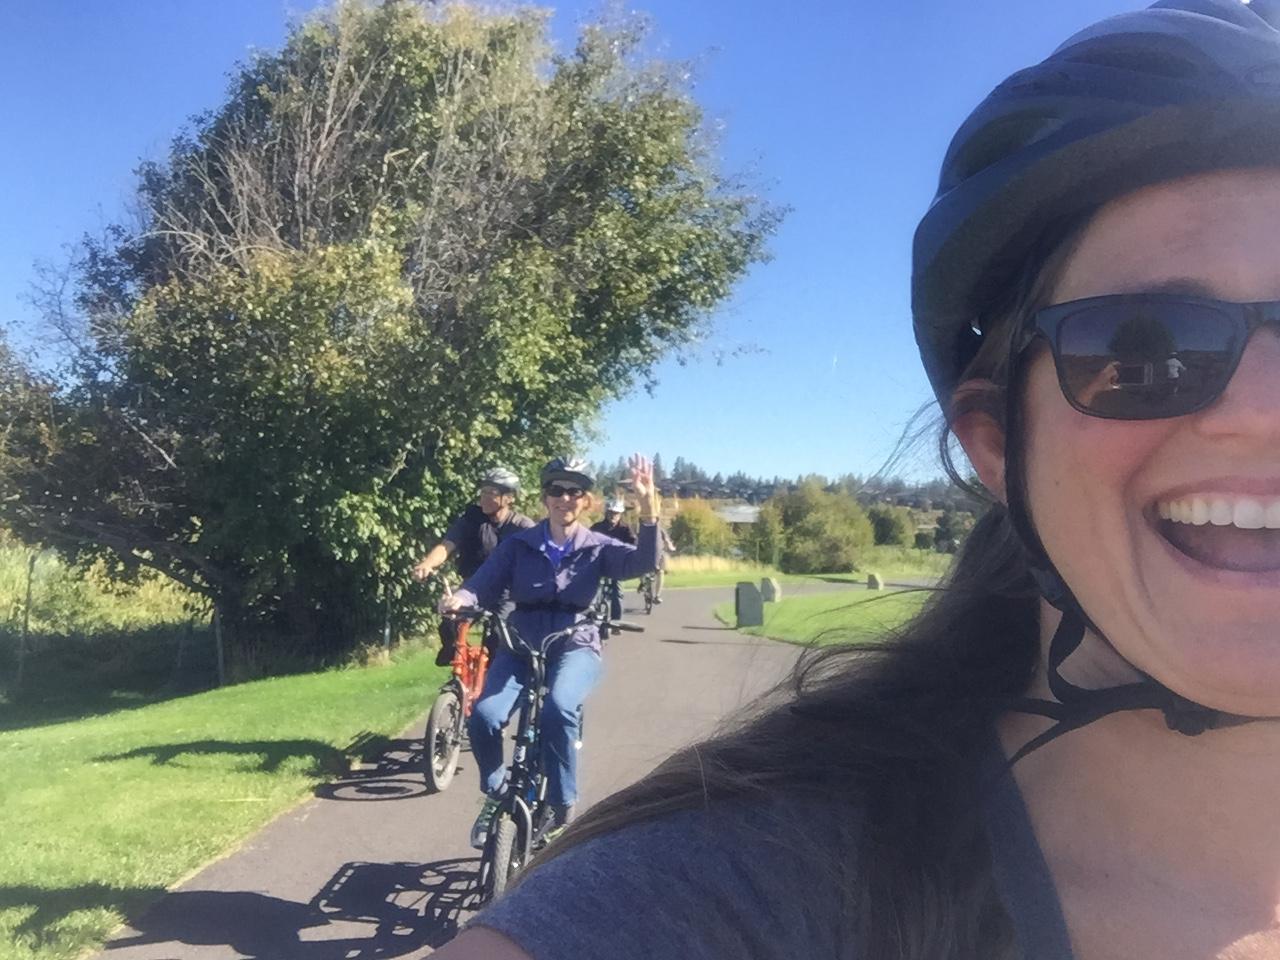 Riding an electric bike in Bend, Oregon.